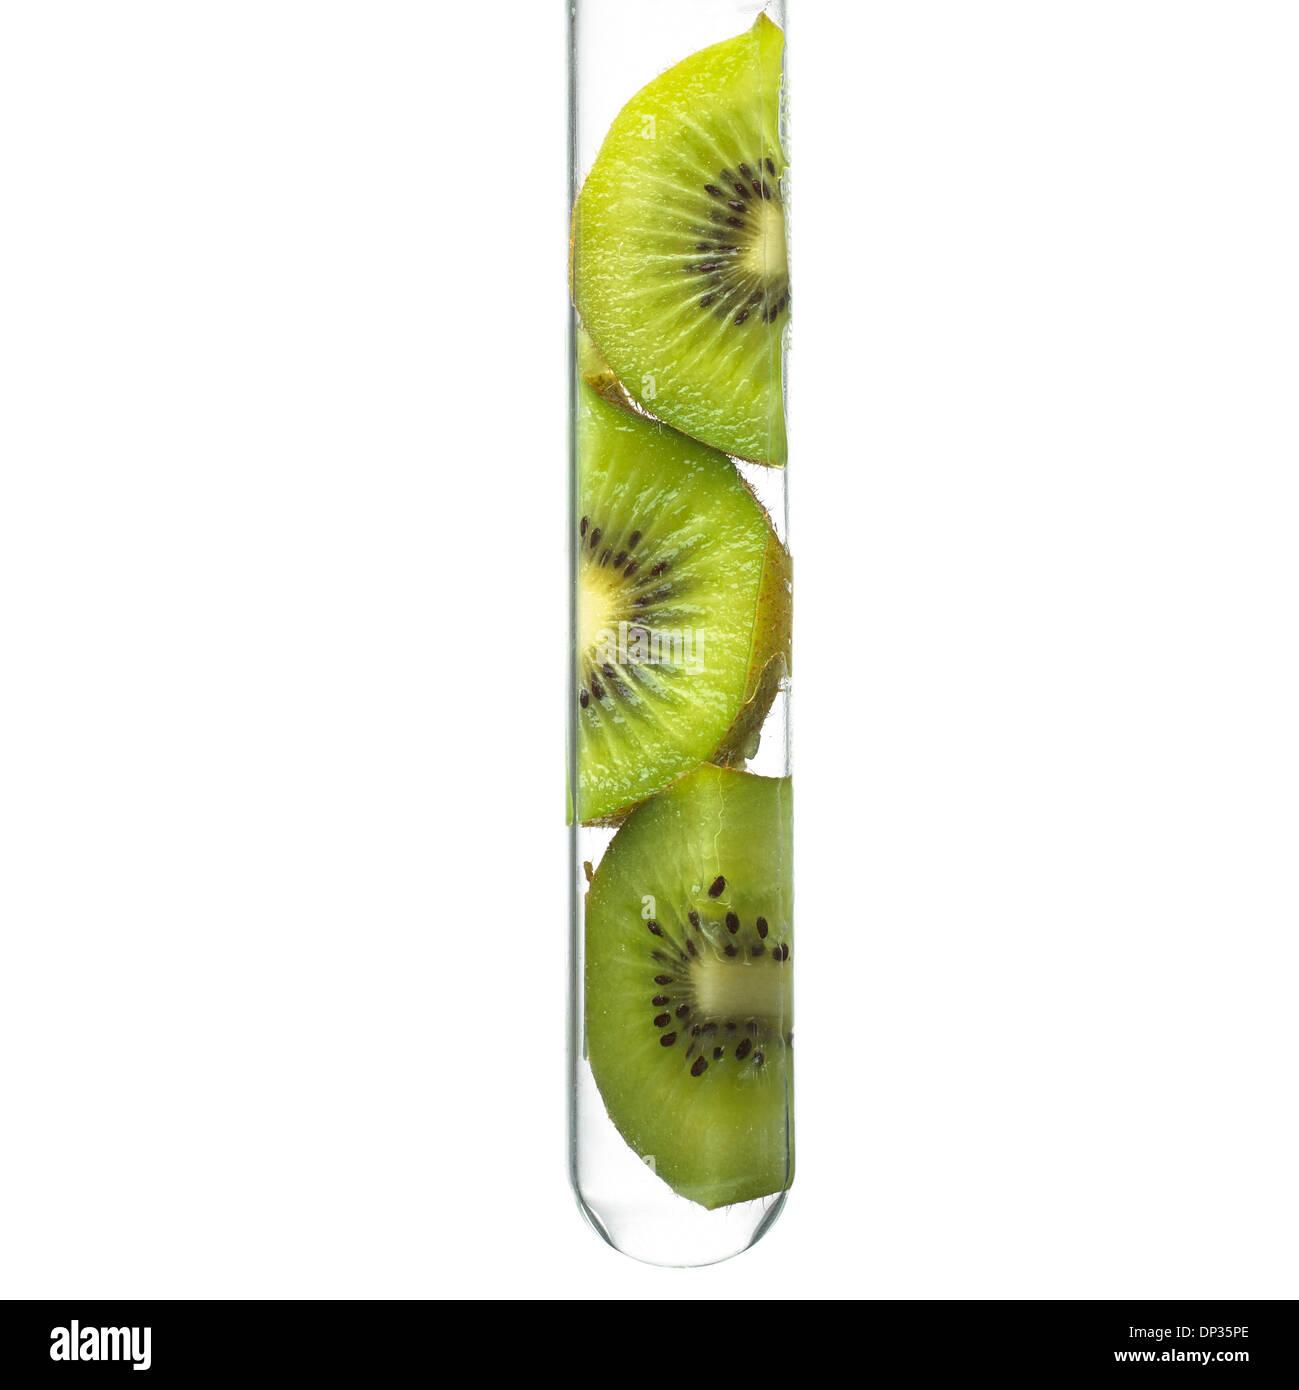 Kiwi slices in a test tube - Stock Image